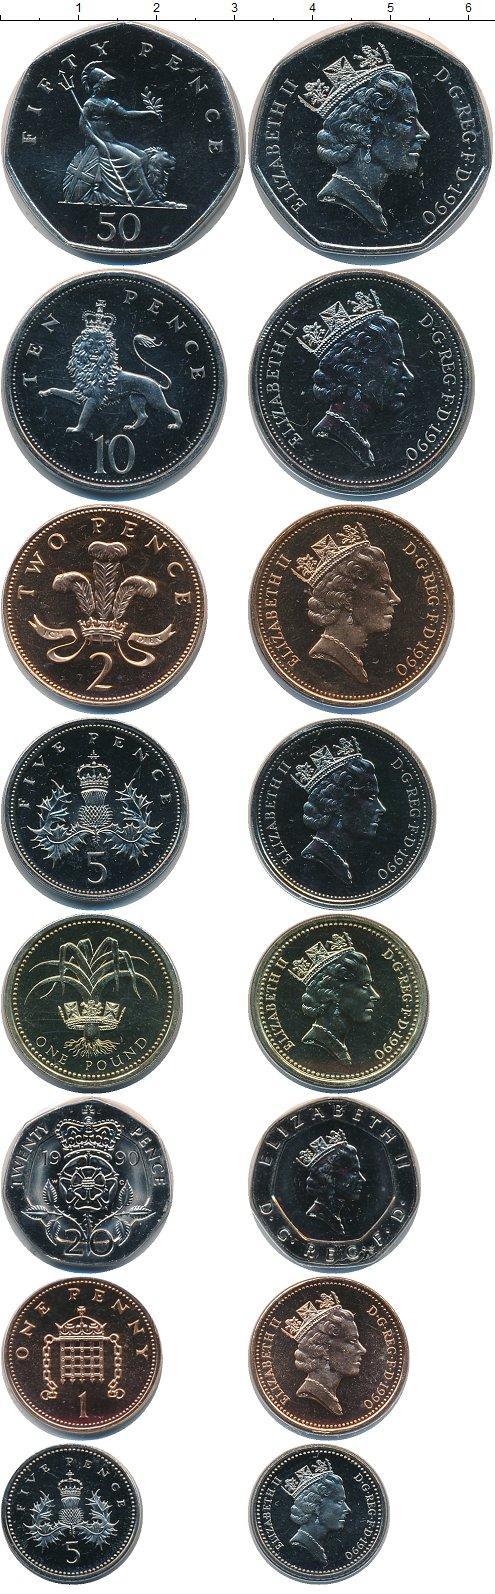 Каталог монет - Великобритания Великобритания 1990